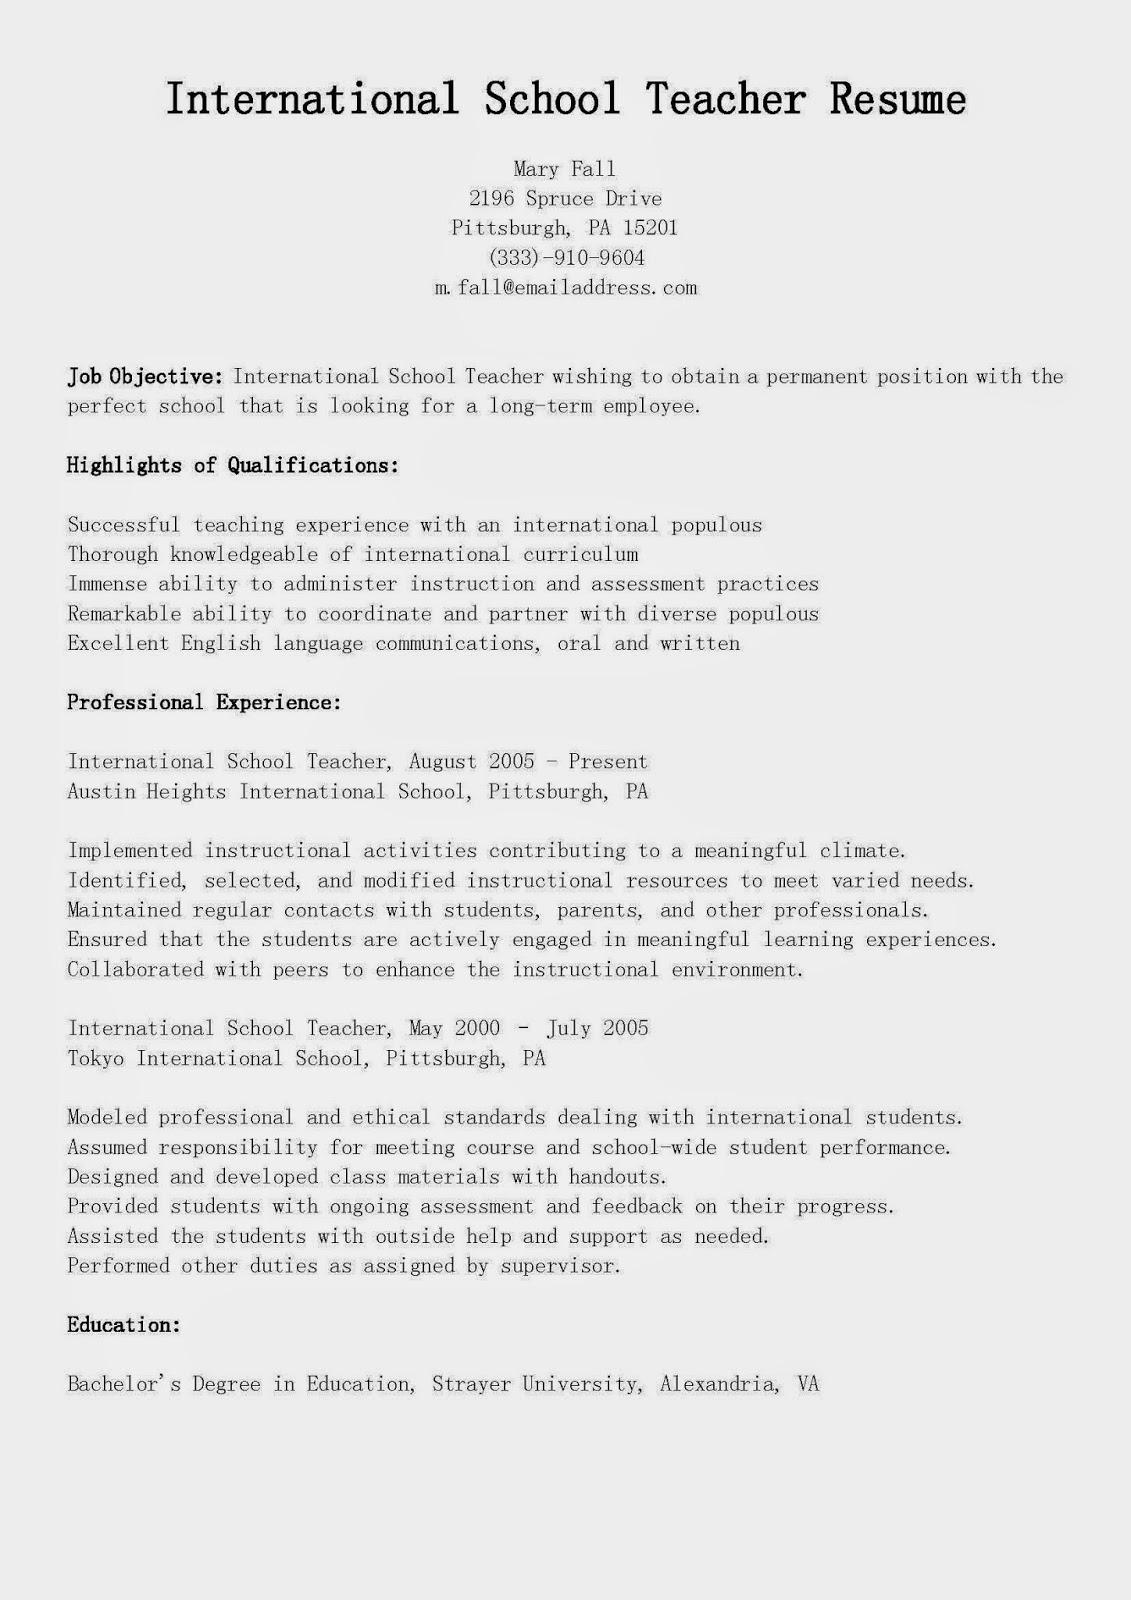 sample resume international school teacher